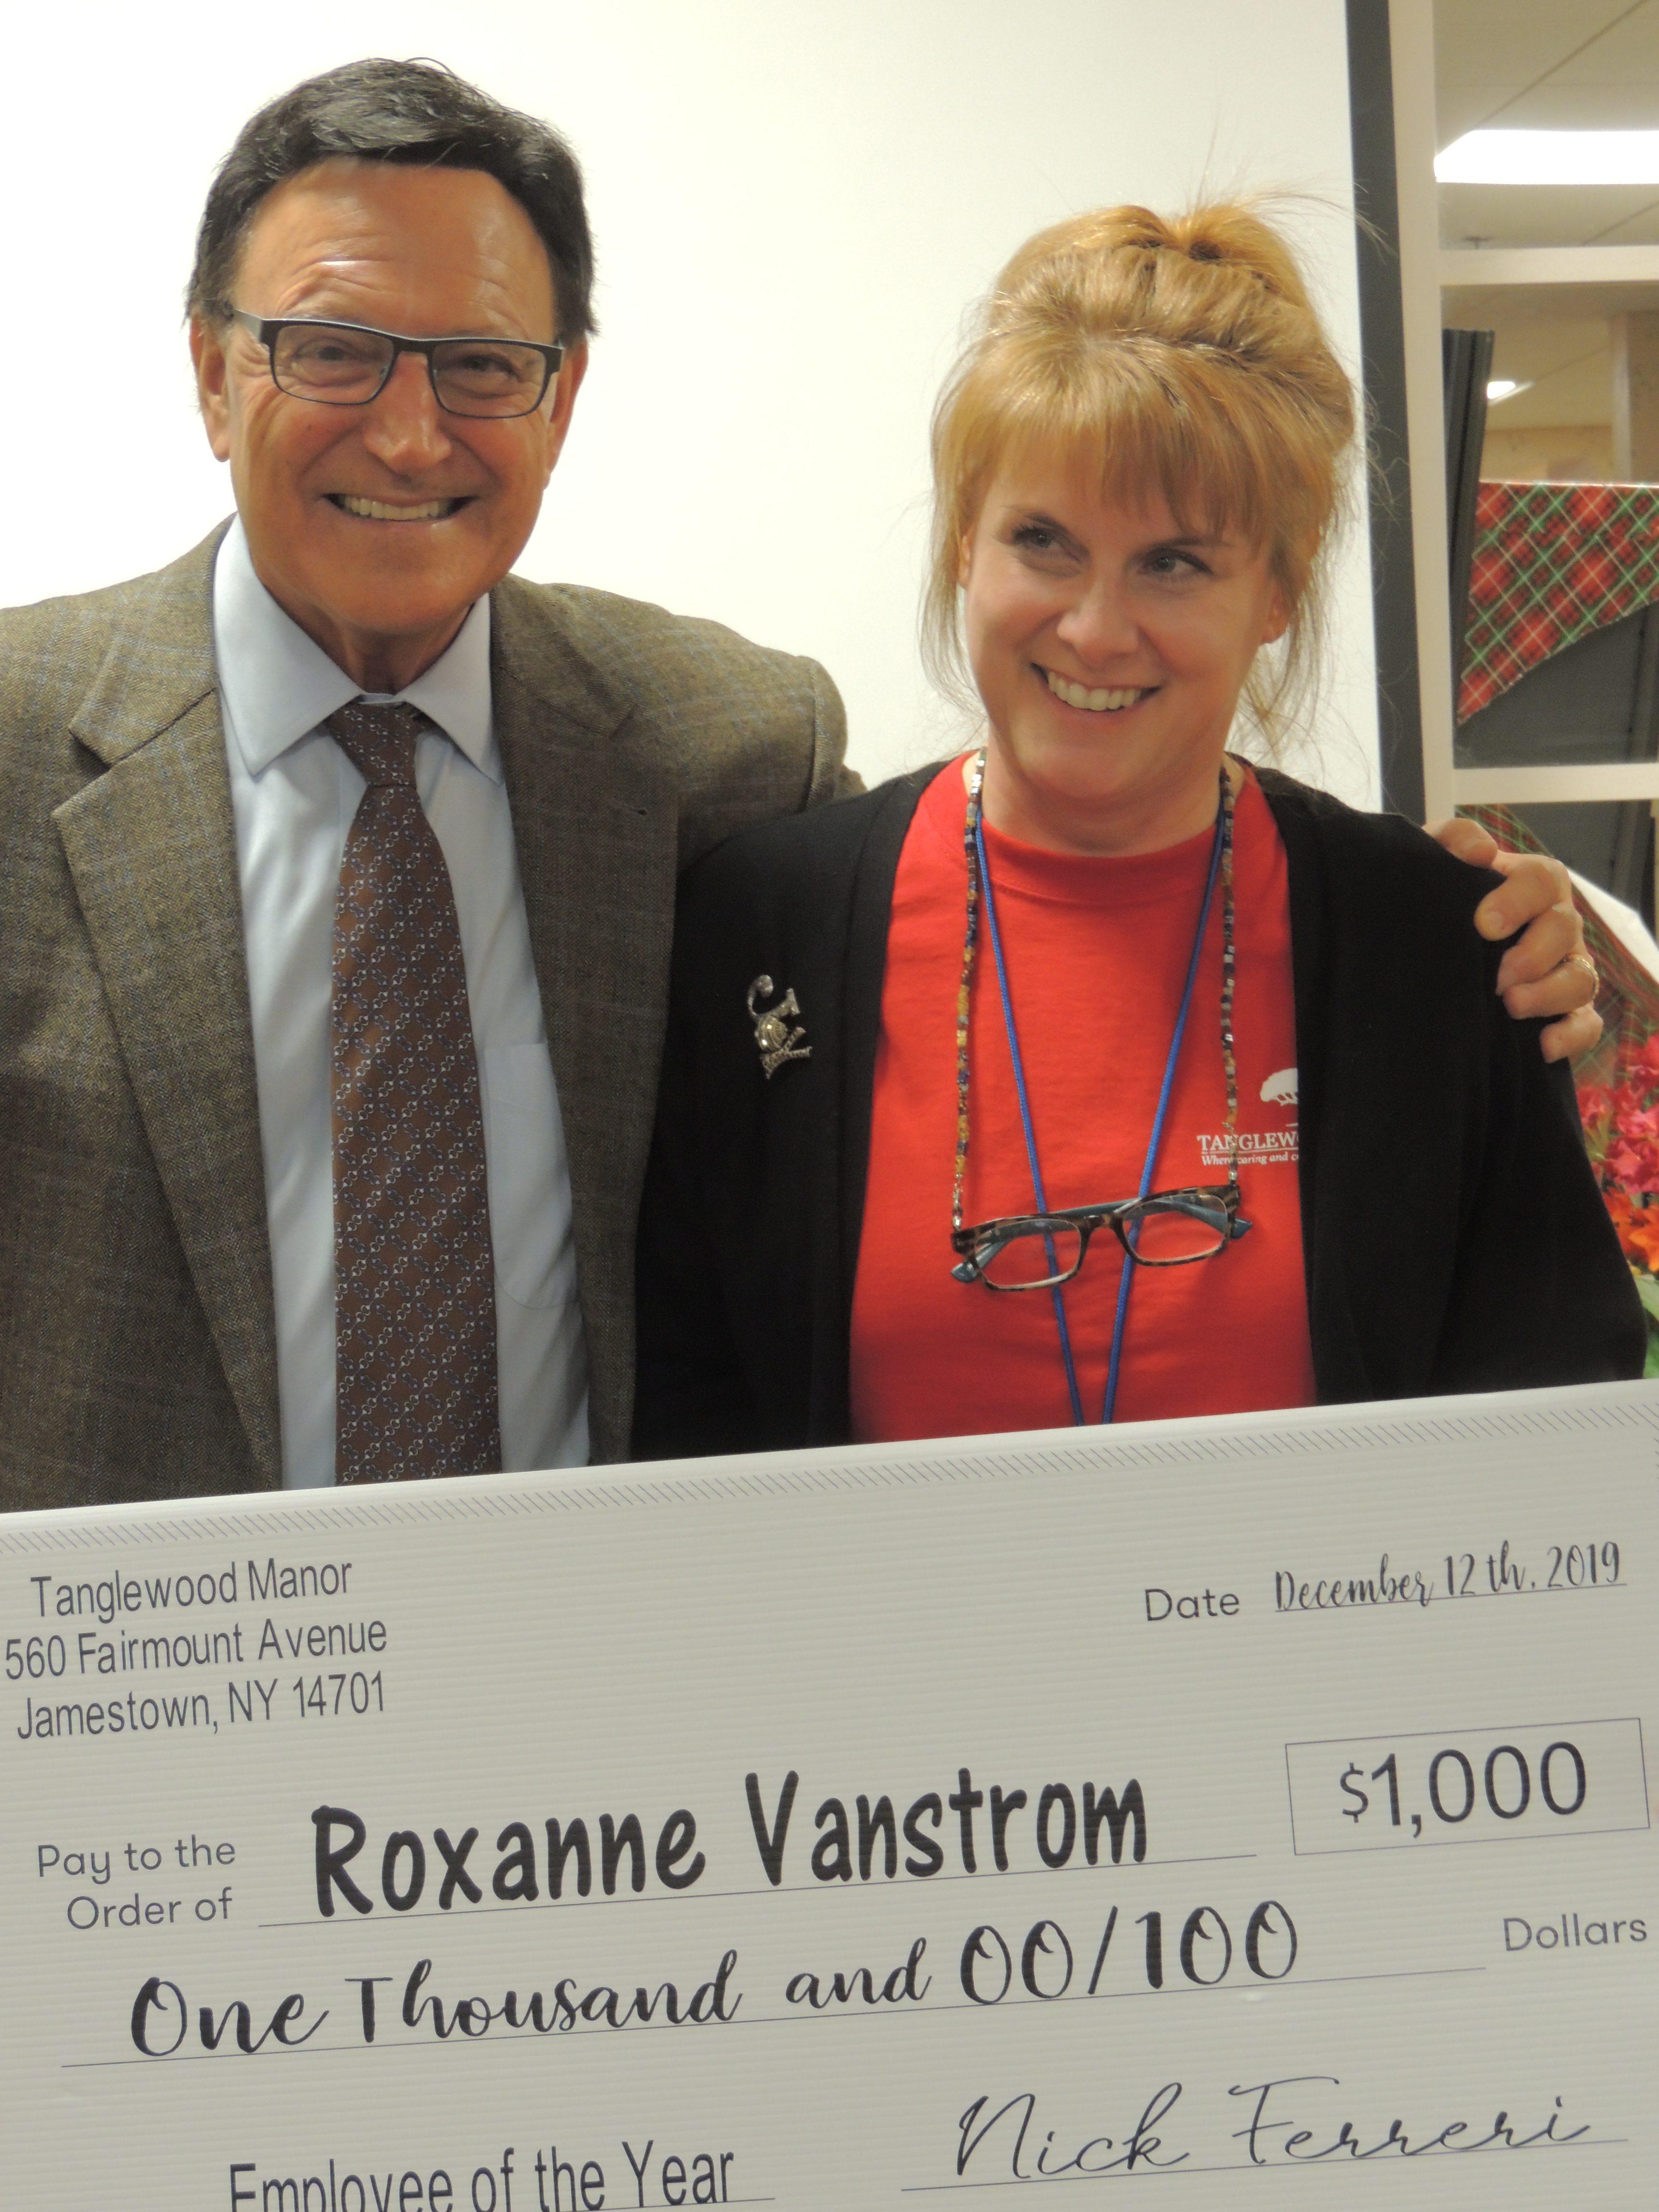 Nick Ferreri and Jamestown Campus Employee of the Year, Roxanne Vanstrom.